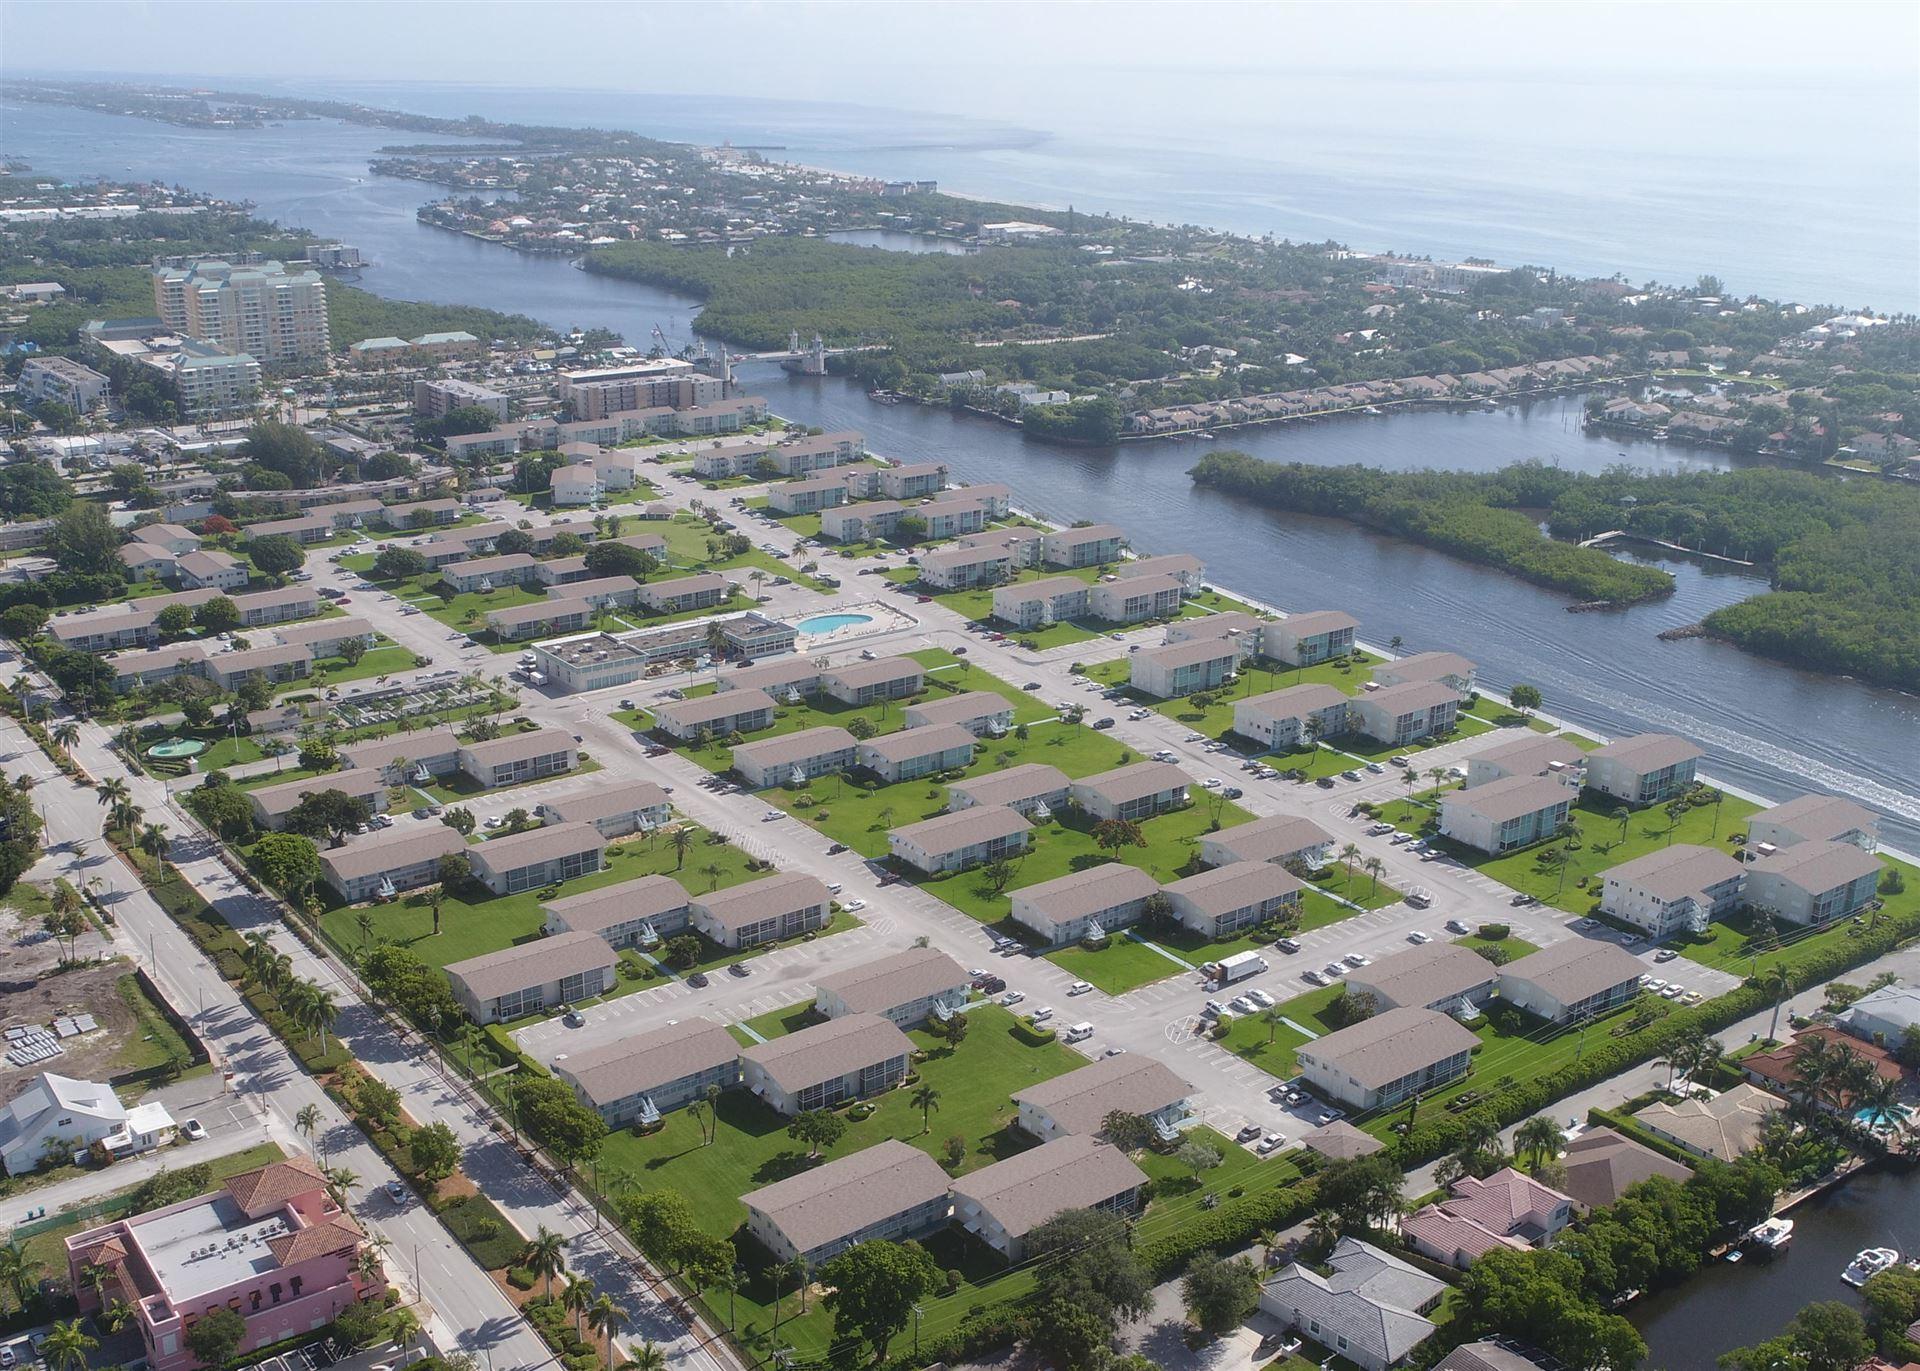 240 Horizons W #208, Boynton Beach, FL 33435 - MLS#: RX-10728690